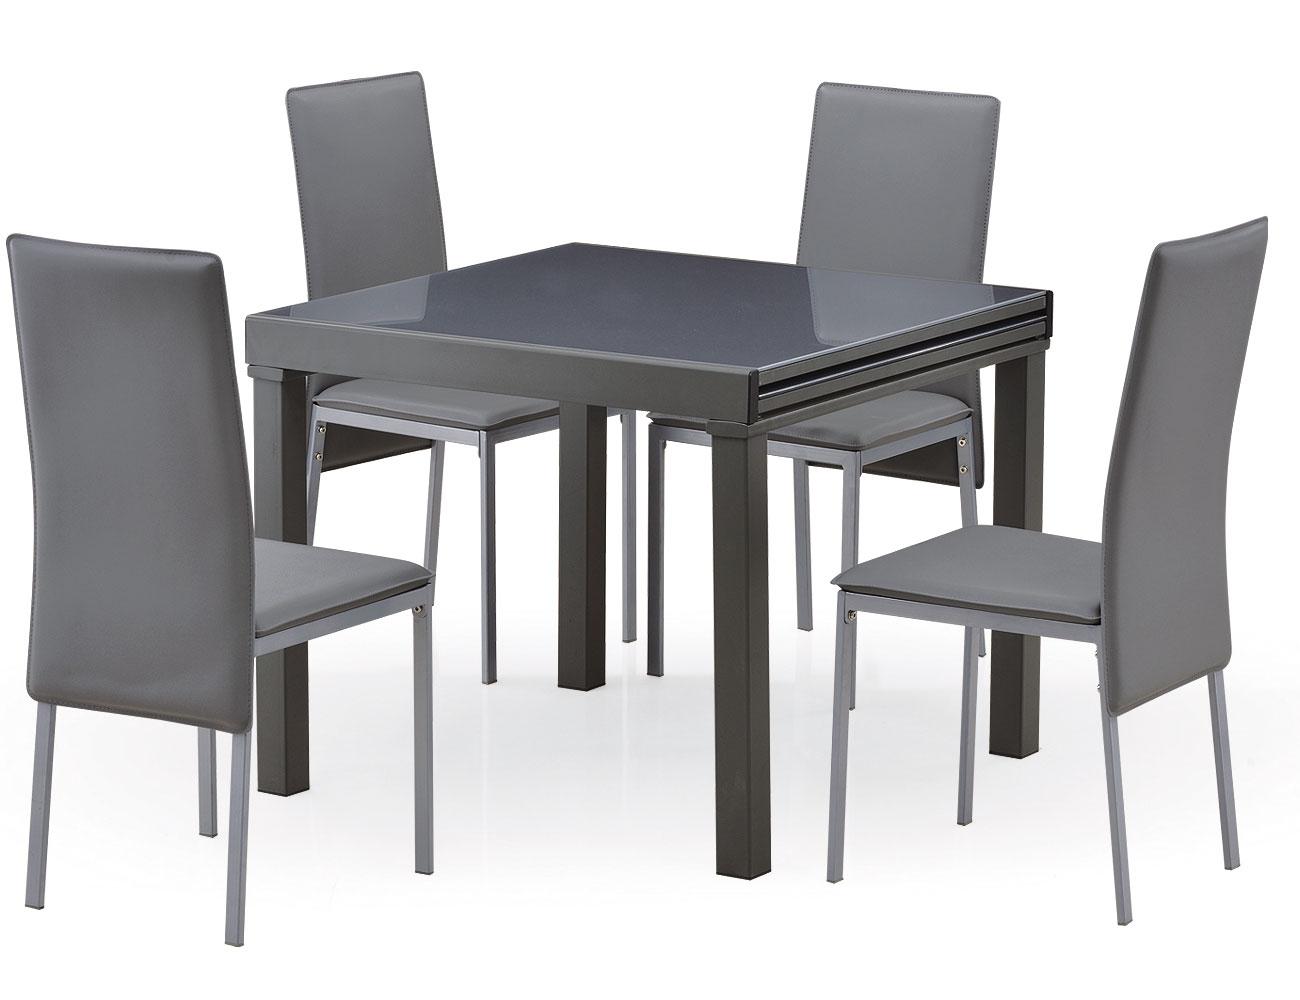 Mesa de comedor cuadrada extensible de 75 cm a 150 cm de for Mesas de cocina cuadradas